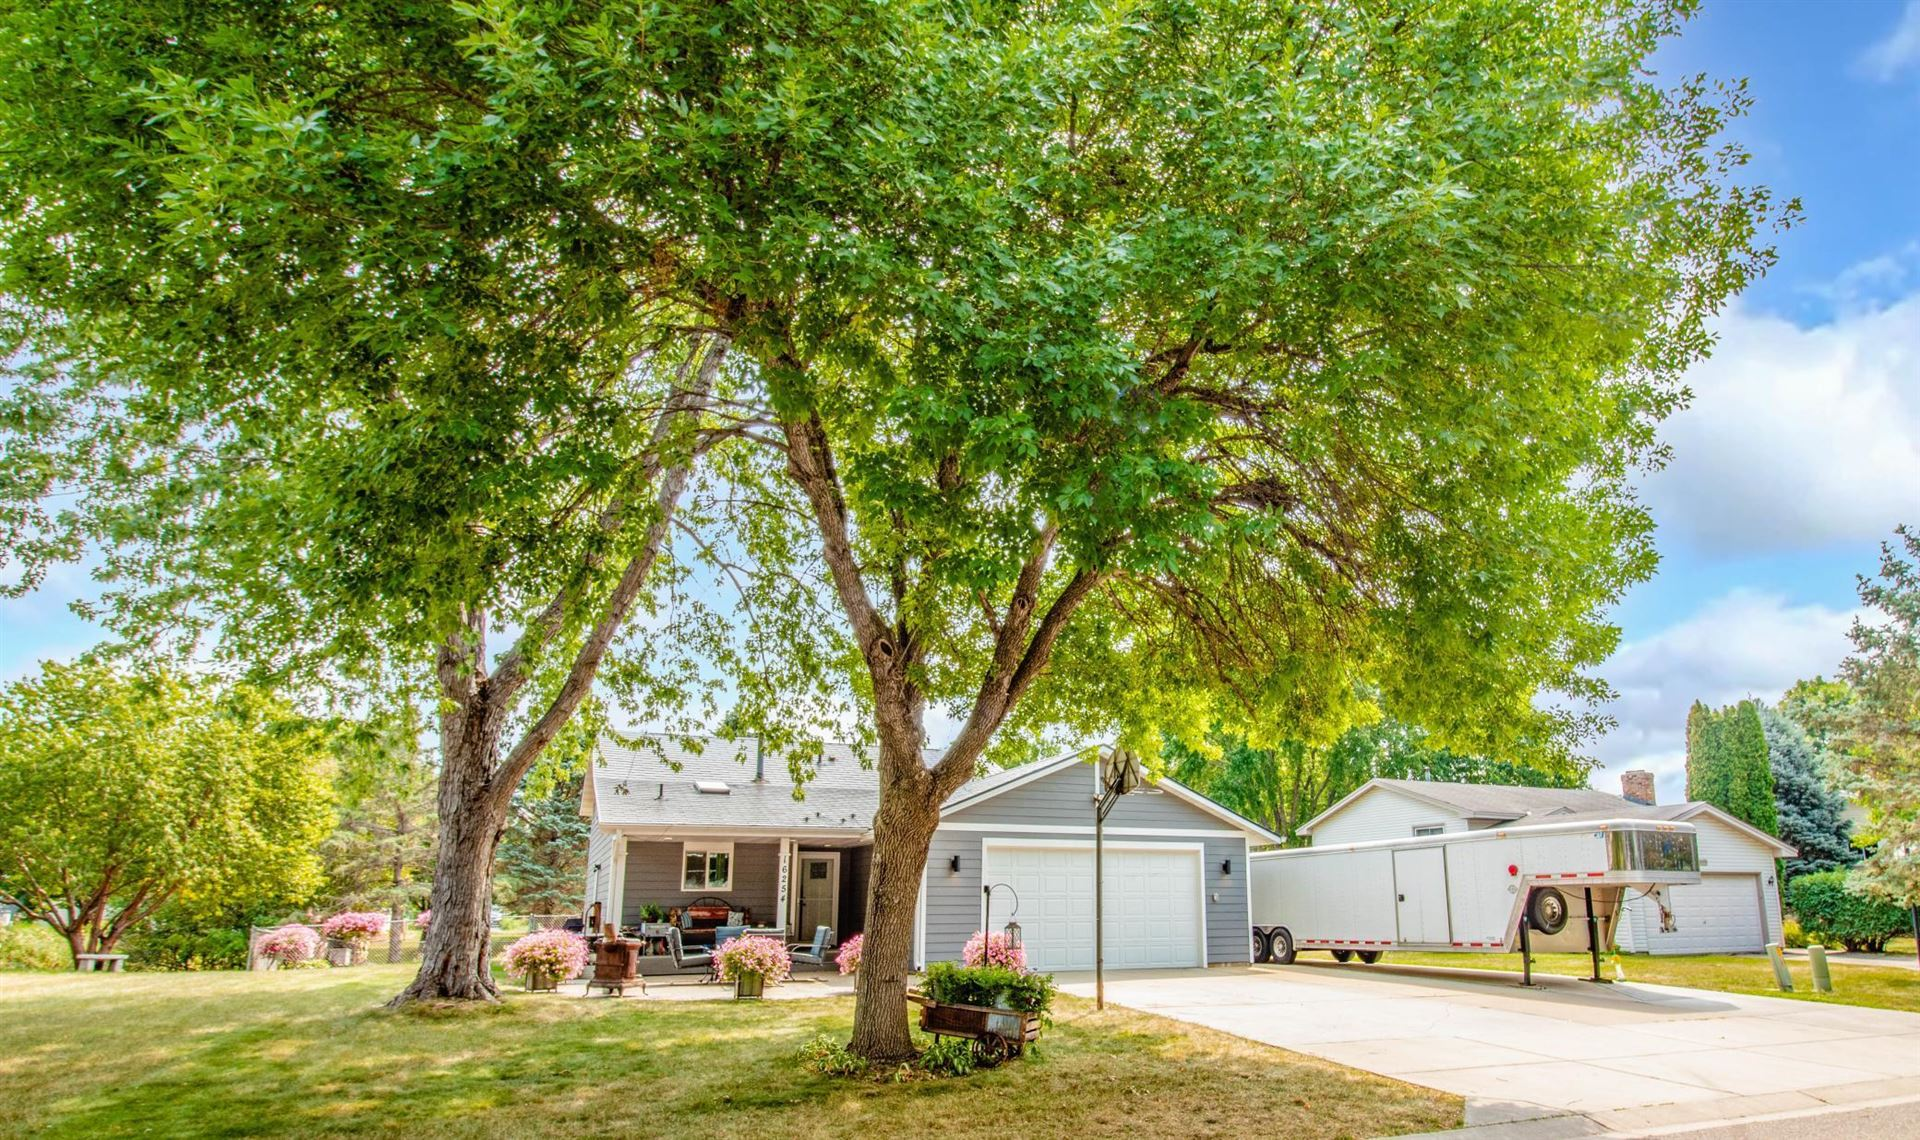 Photo of 16254 Fantasia Avenue, Lakeville, MN 55068 (MLS # 6074079)